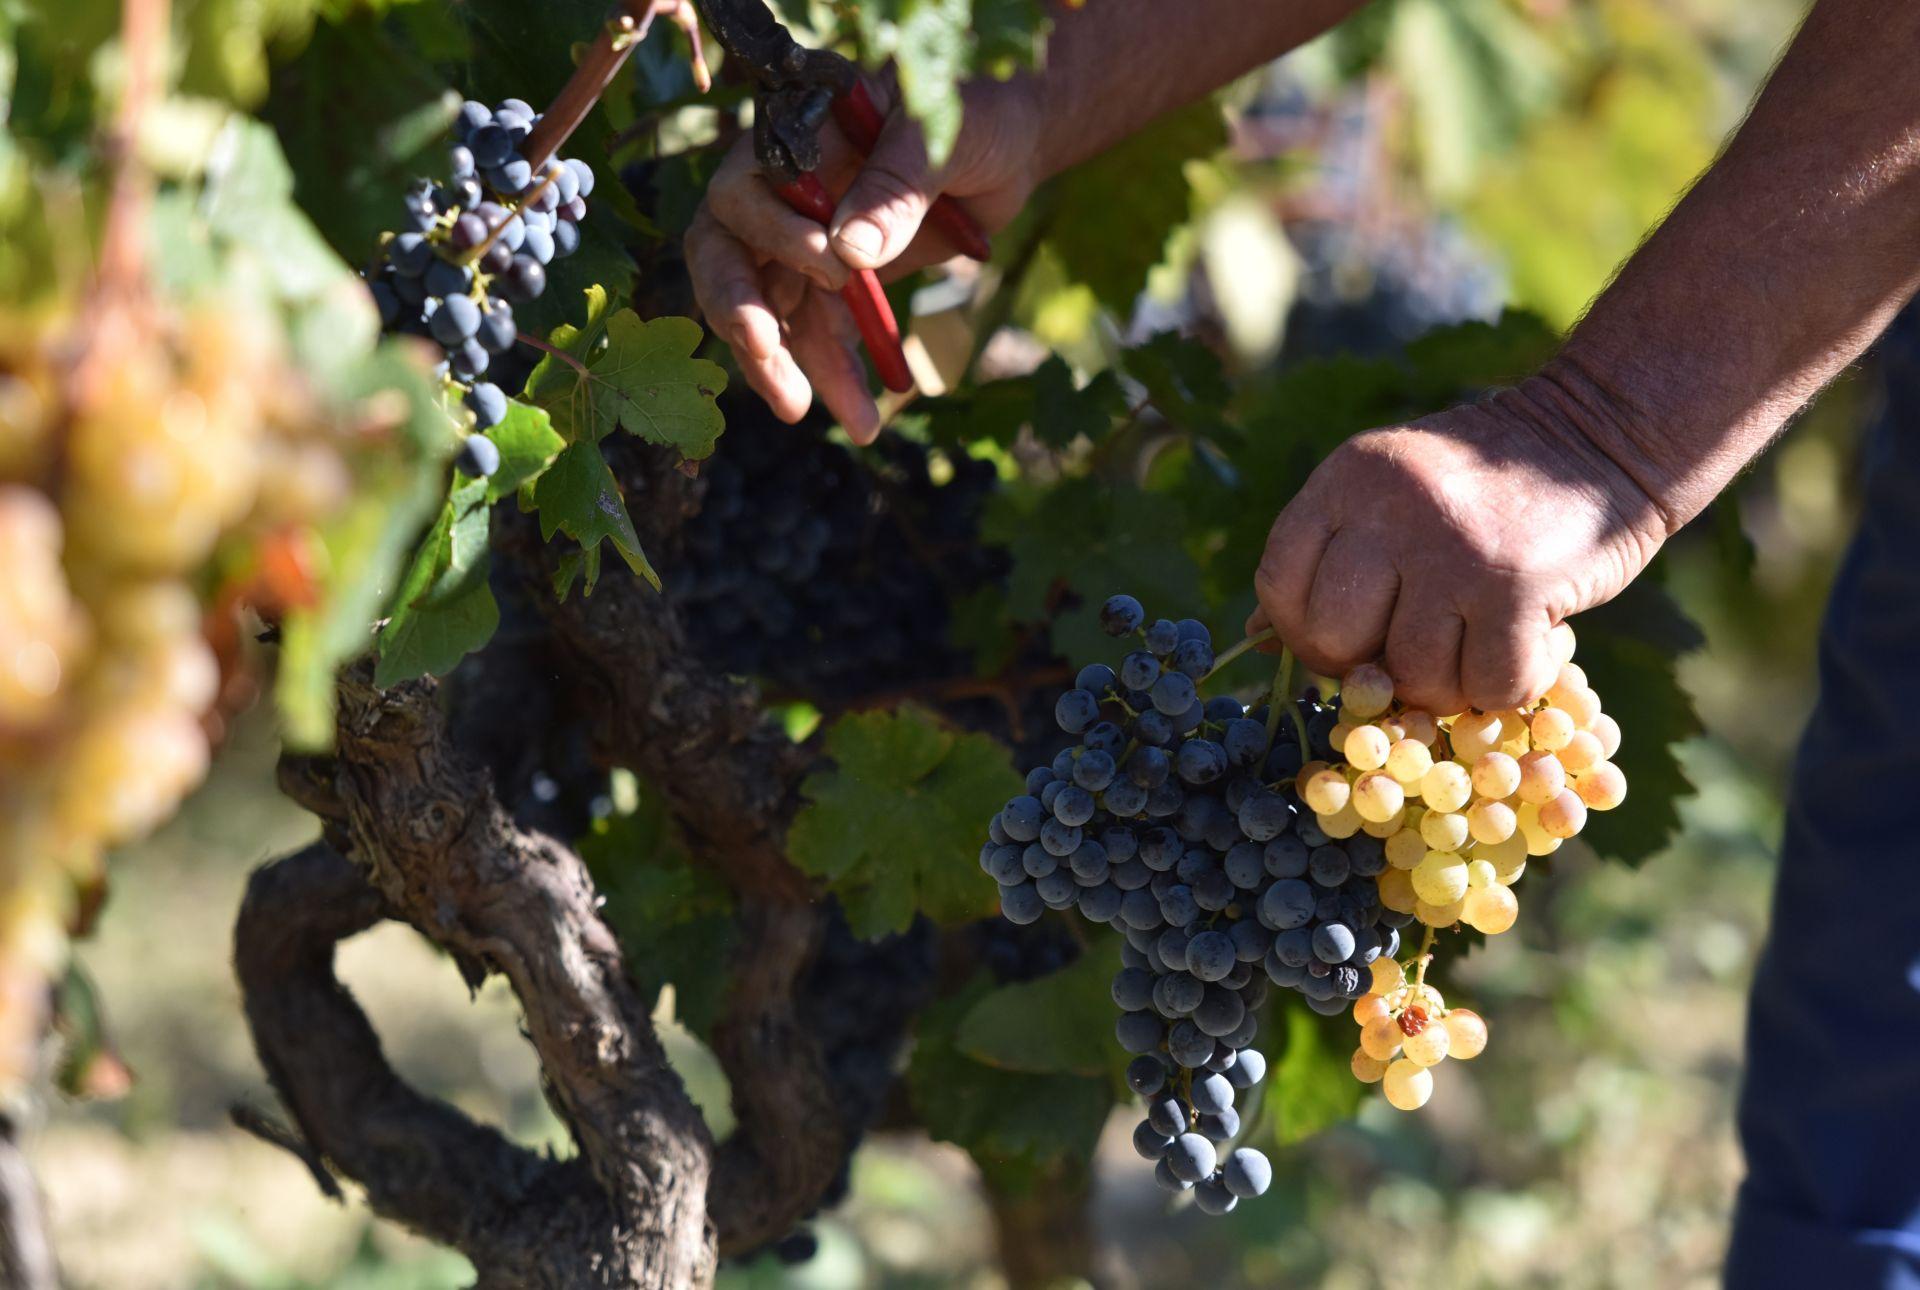 Otvoren predstečajni postupak nad šibenskom Vinoplod Vinarijom